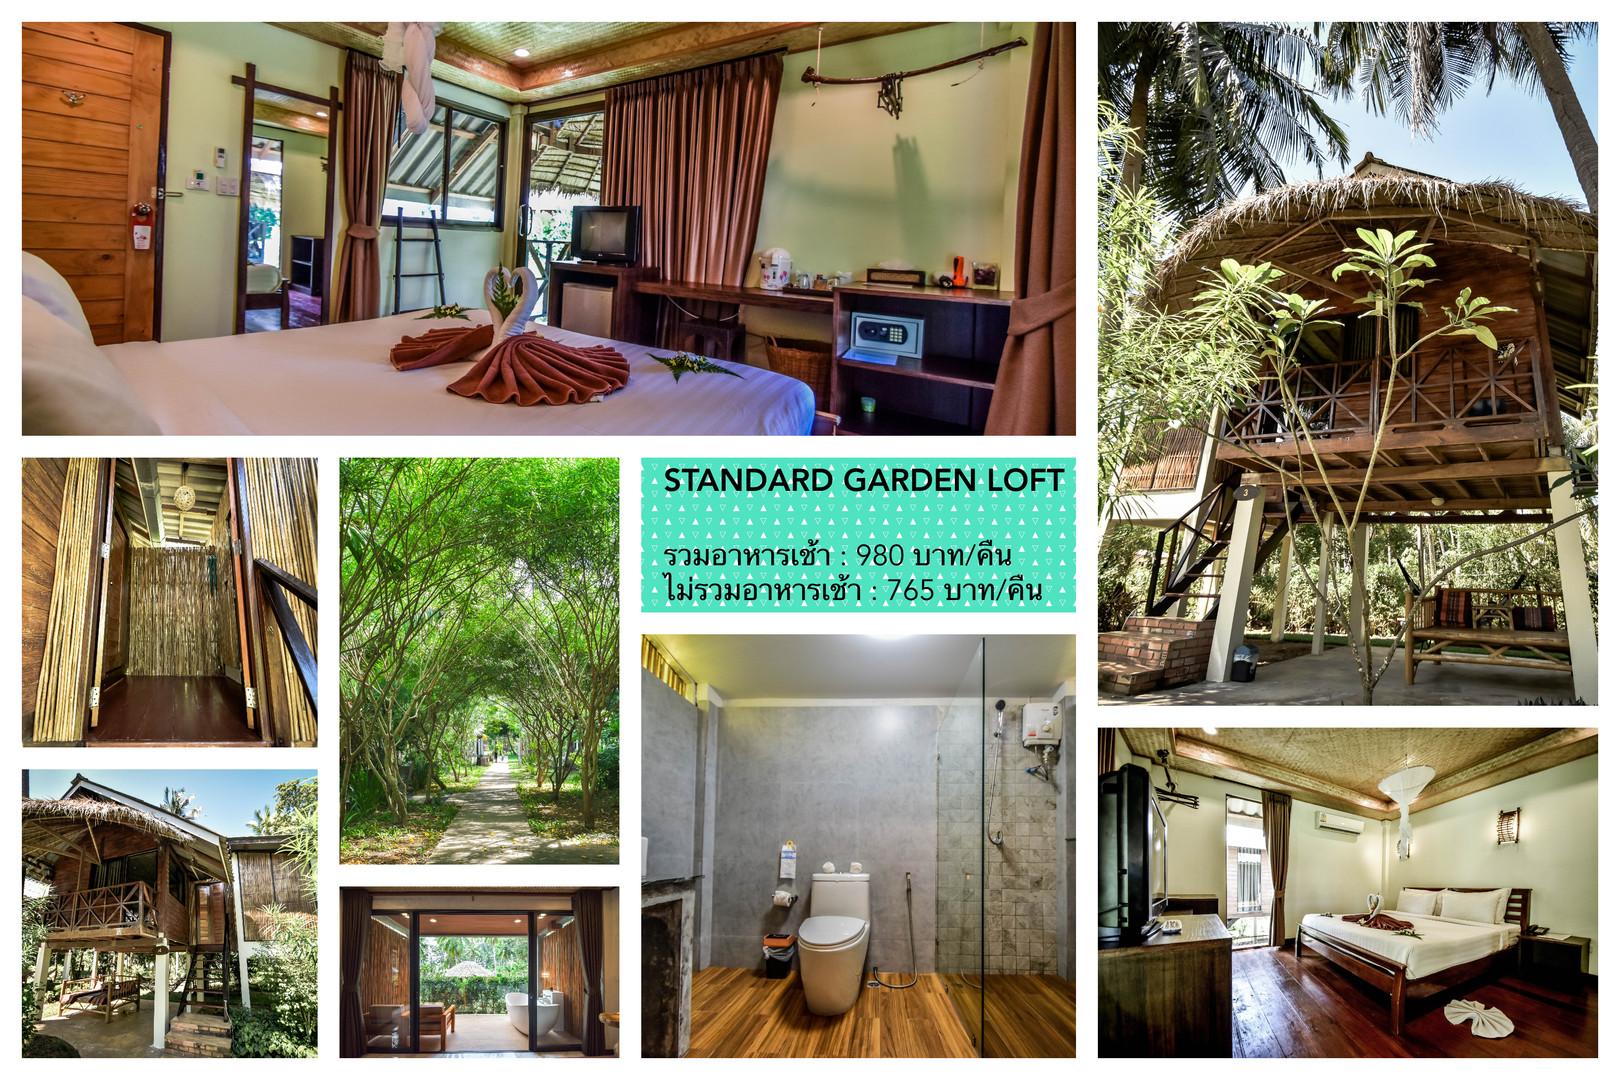 Standard Garden Loft.jpg